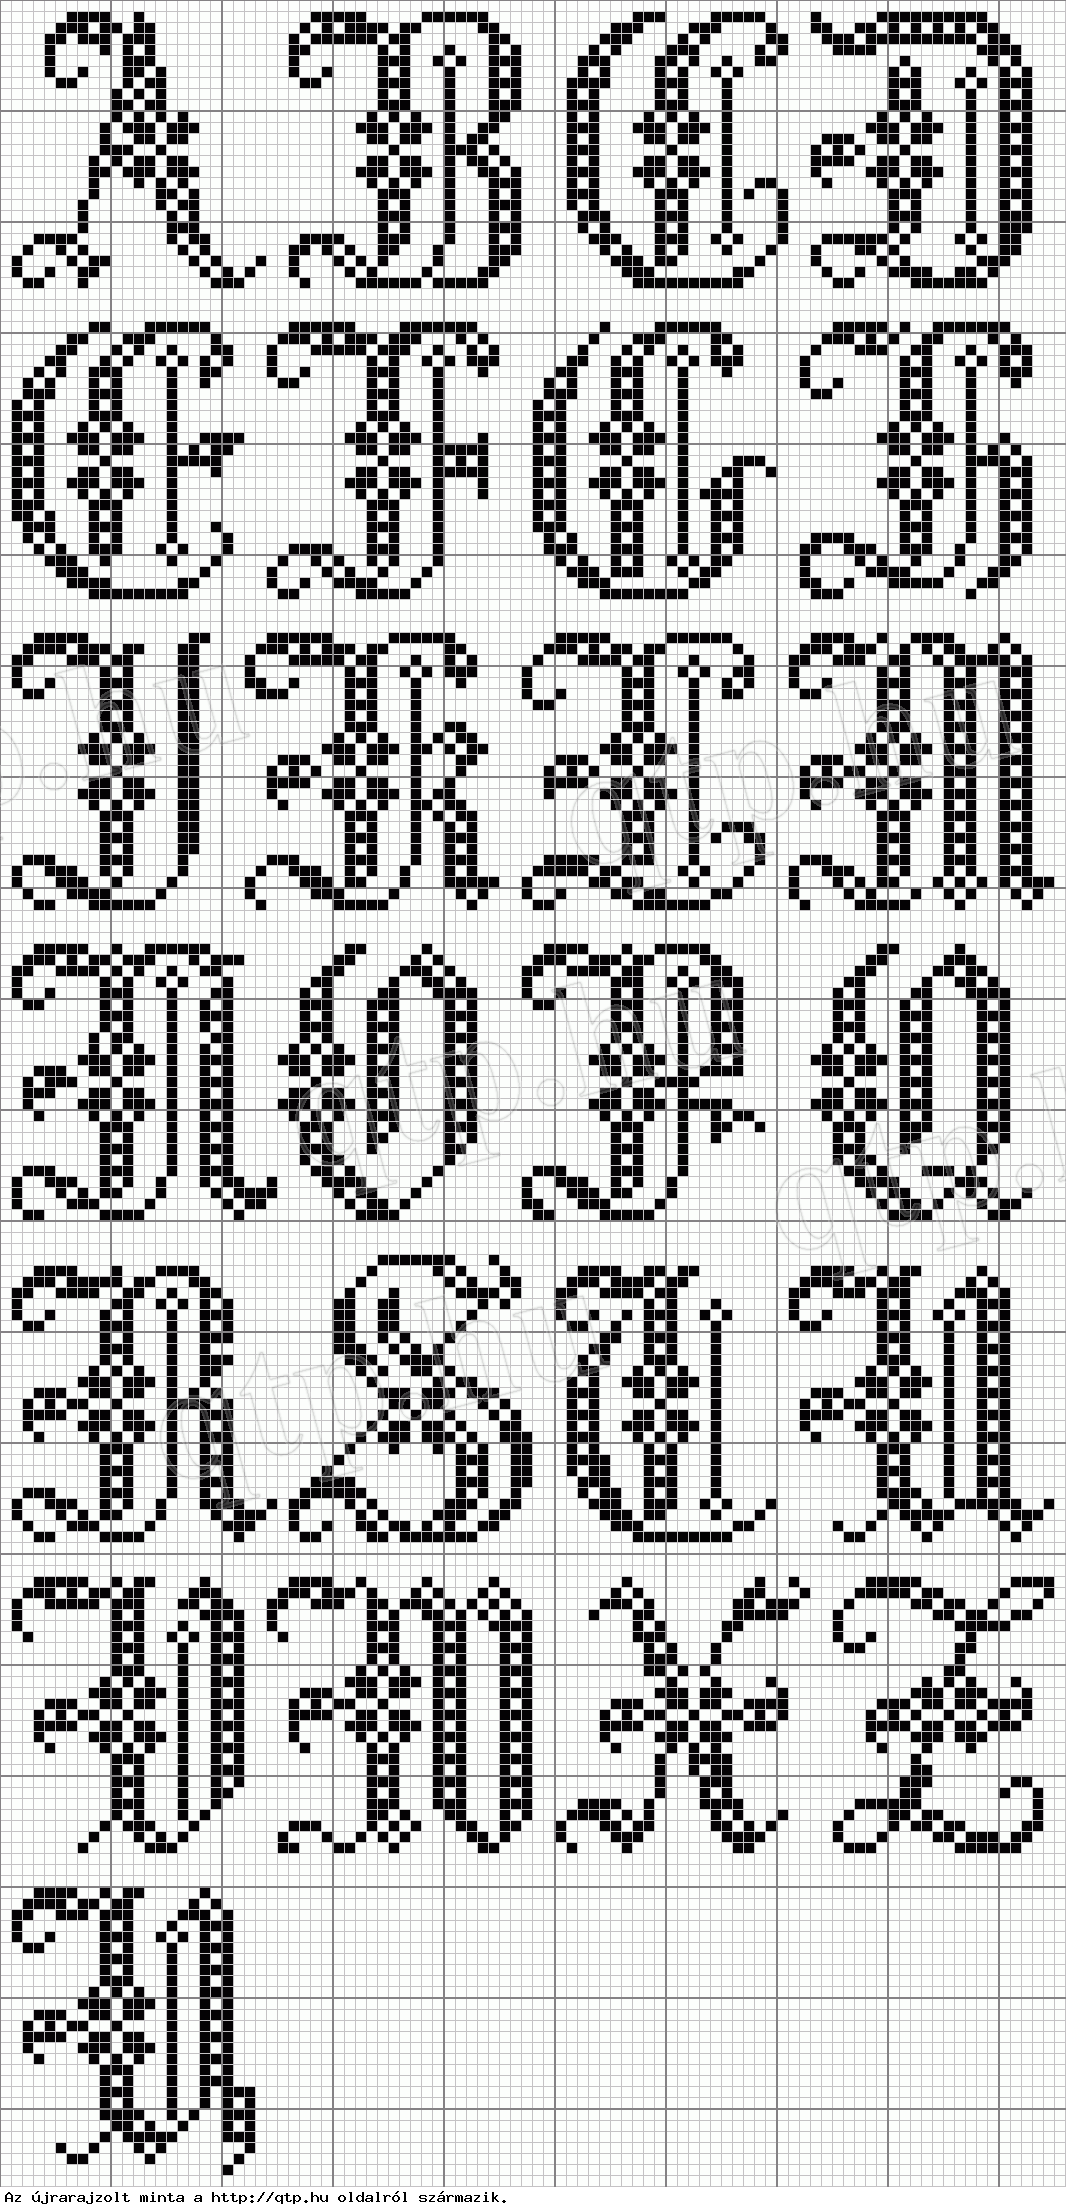 Free Cross Stitch Alphabet Patterns : cross, stitch, alphabet, patterns, Cross, Stitch, Alphabet, Fonts,, Alphabet,, Samplers